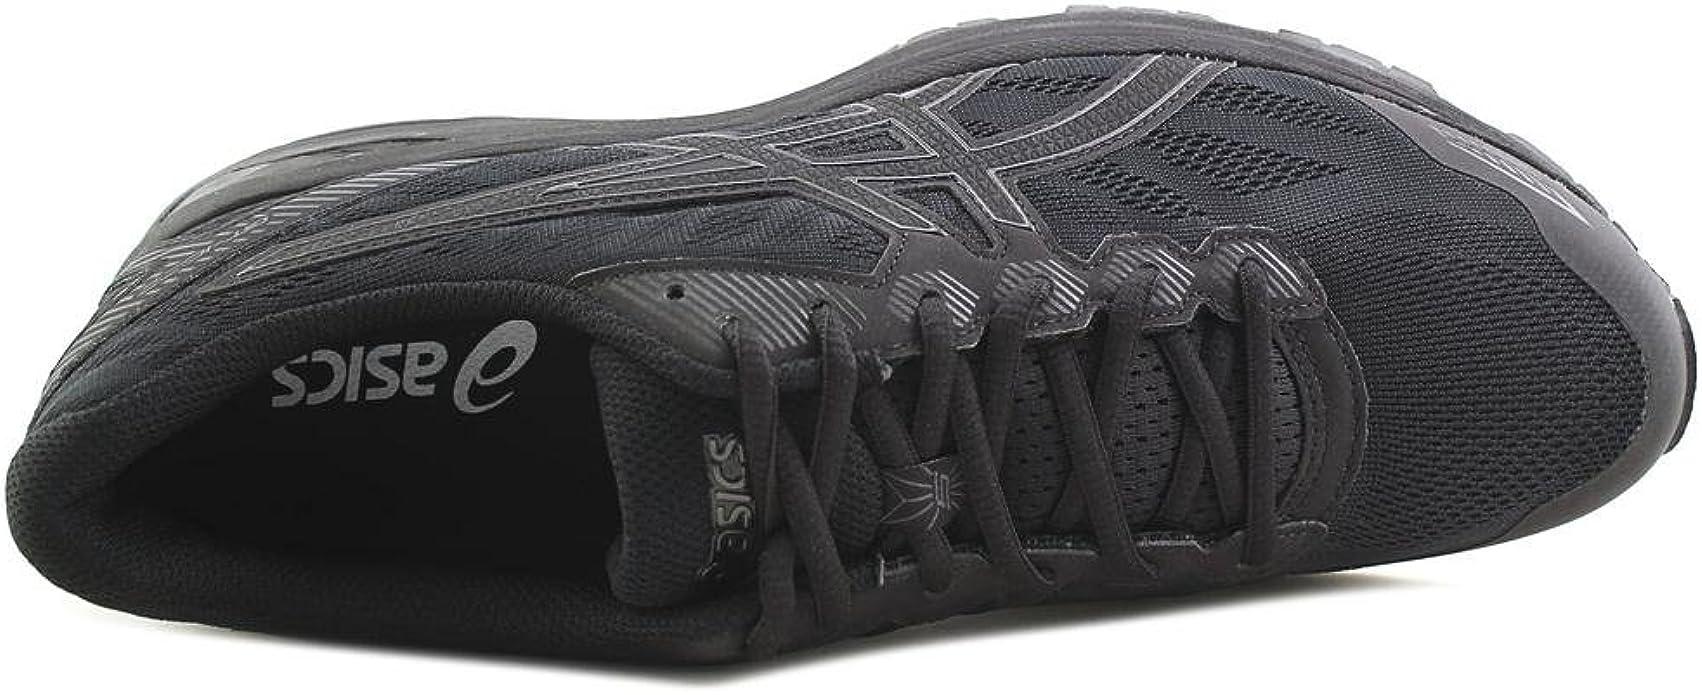 ASICS Mens Performance Gel-Ziruss Running Shoe - T7J1N.9090 (Black/Black/Silver - 11): Amazon.es: Zapatos y complementos